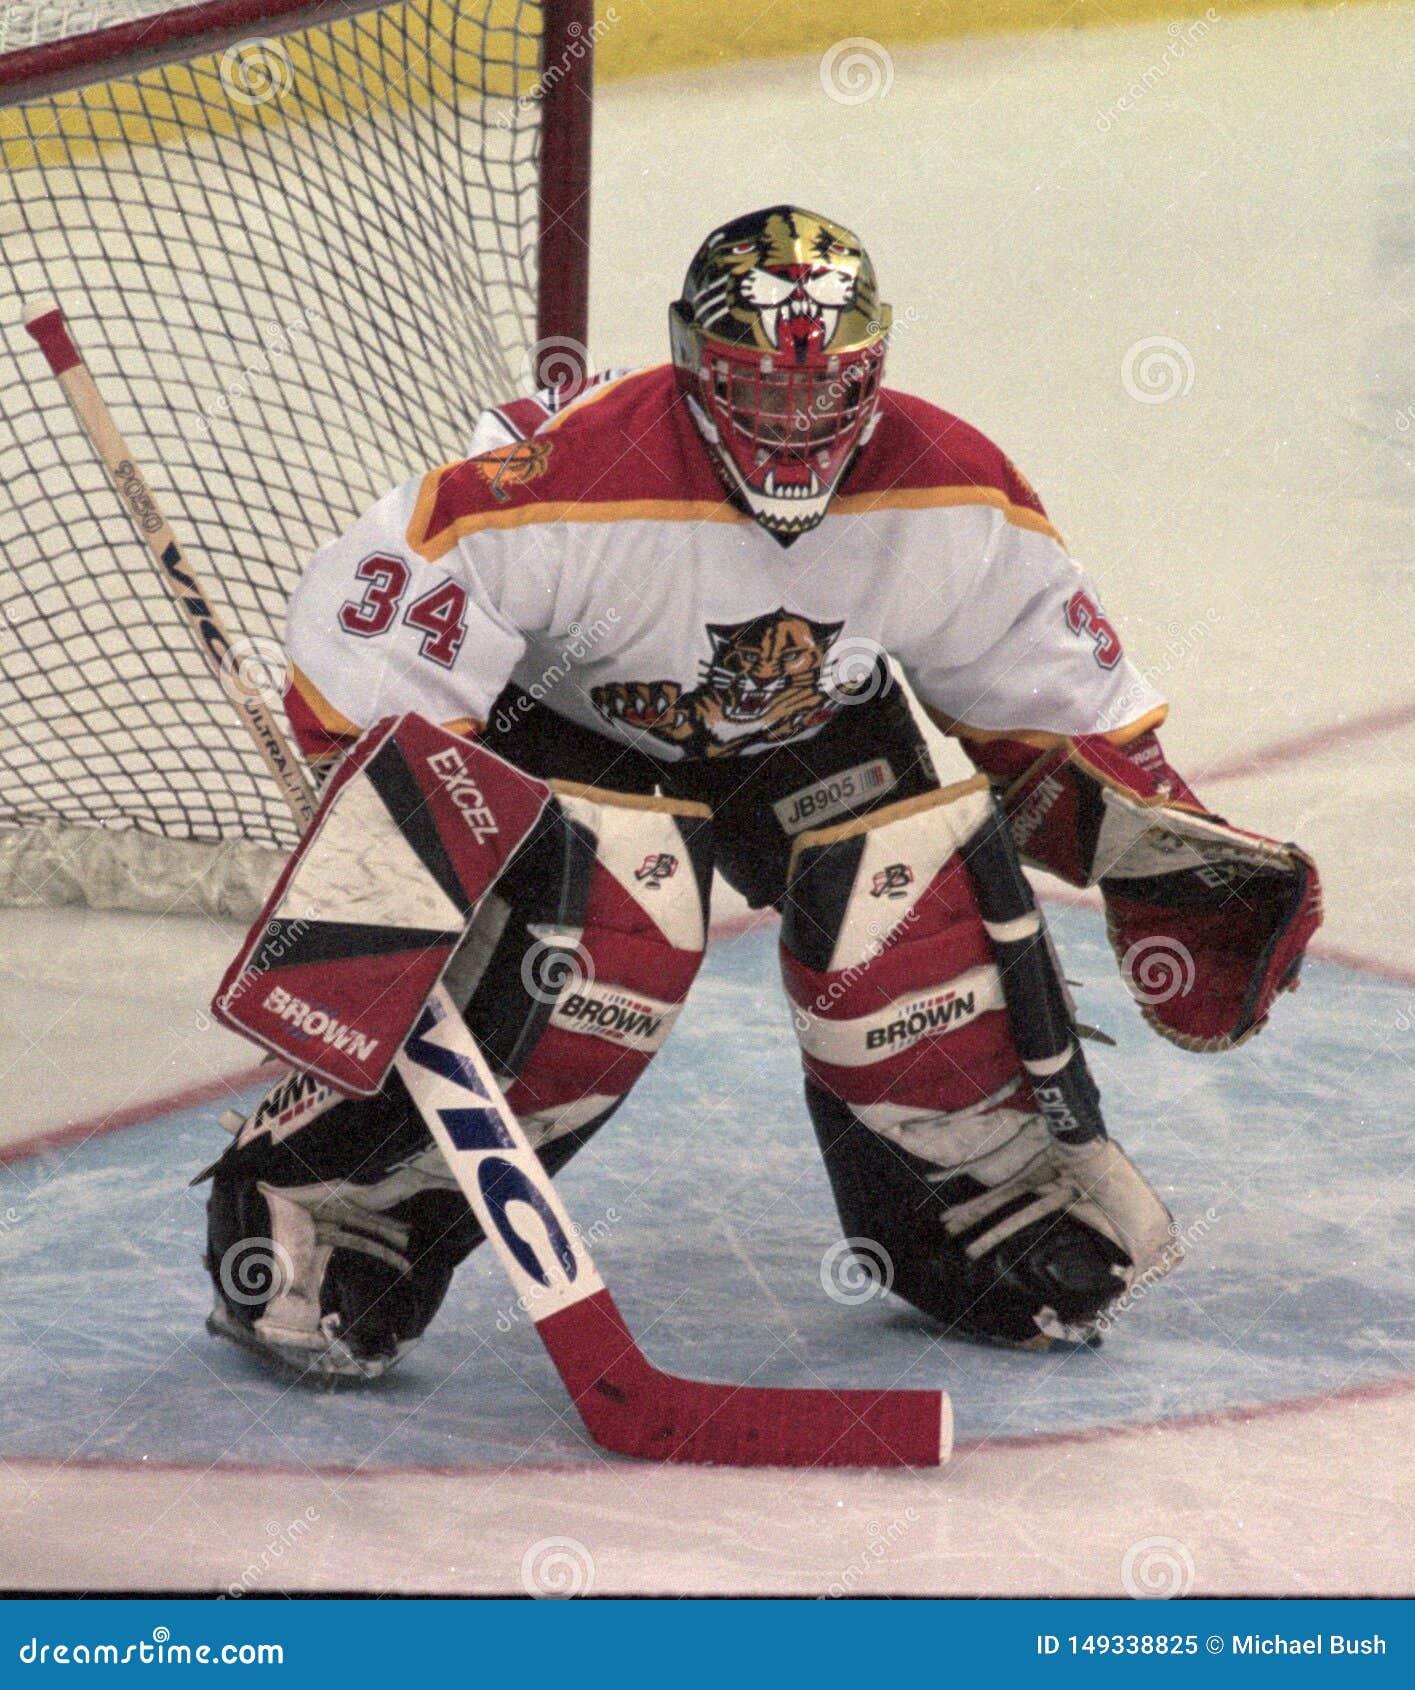 NHL Goalie John Vanbiesbrouck